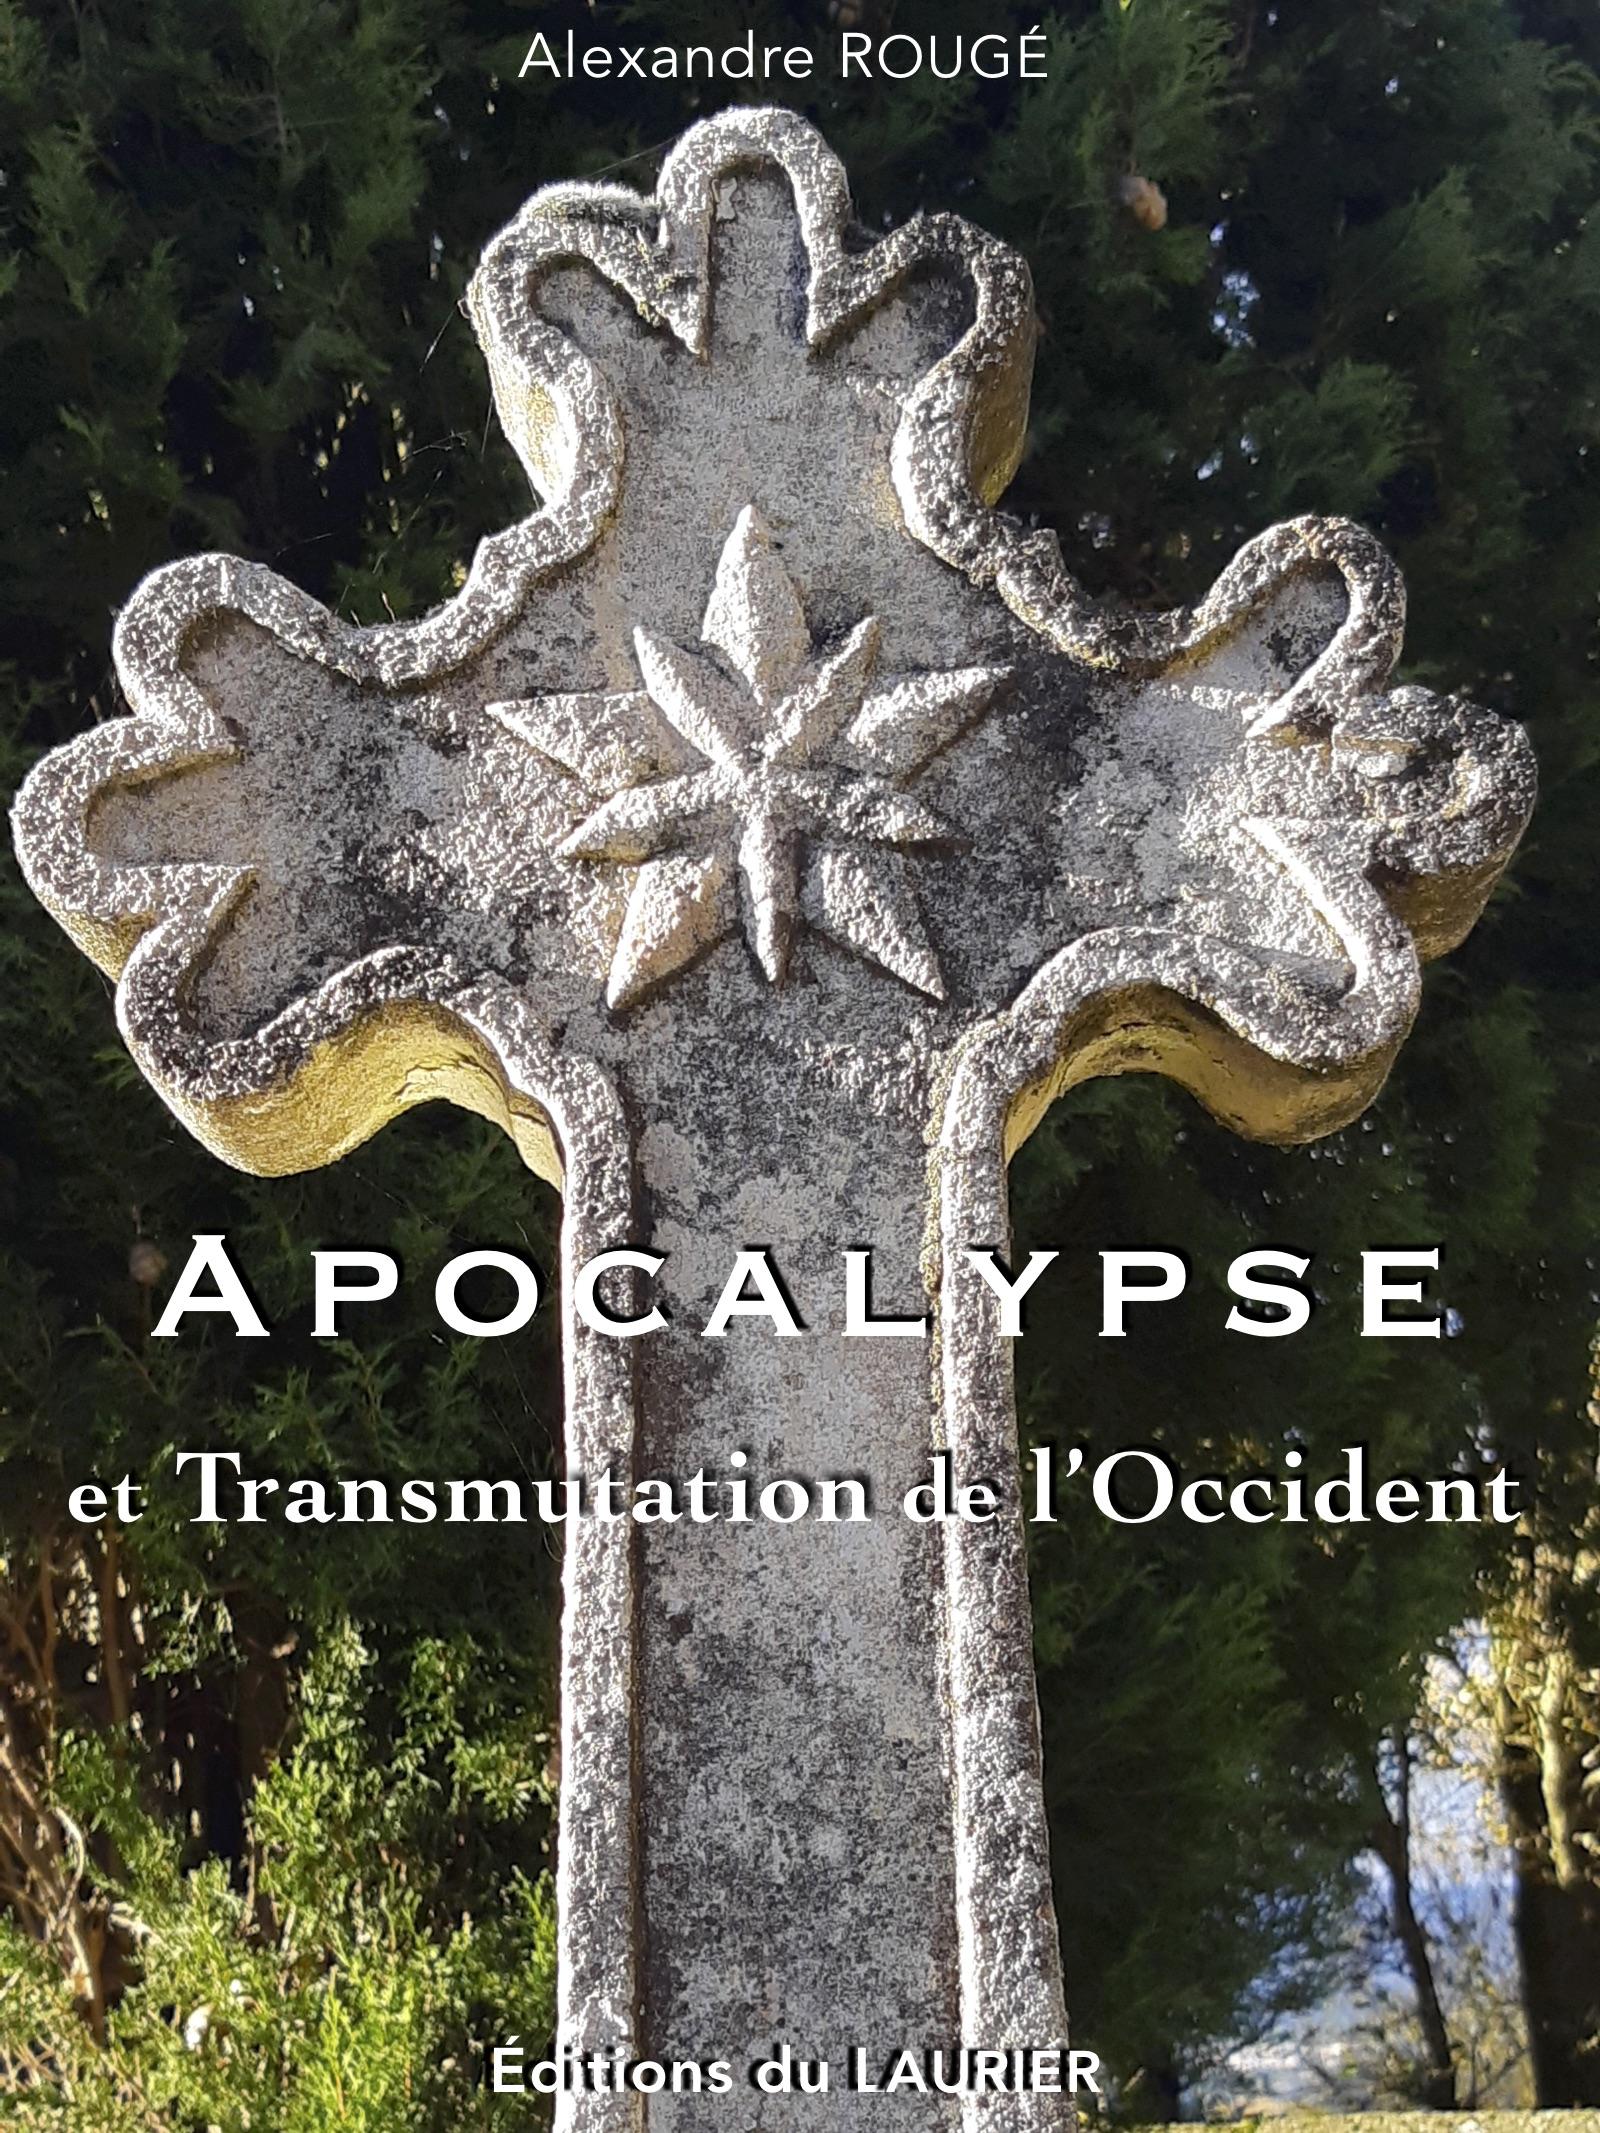 Les Cathares 700 Ans Plus Tard : cathares, Bilan, Gnostique, L'Occident, Éditions, Laurier